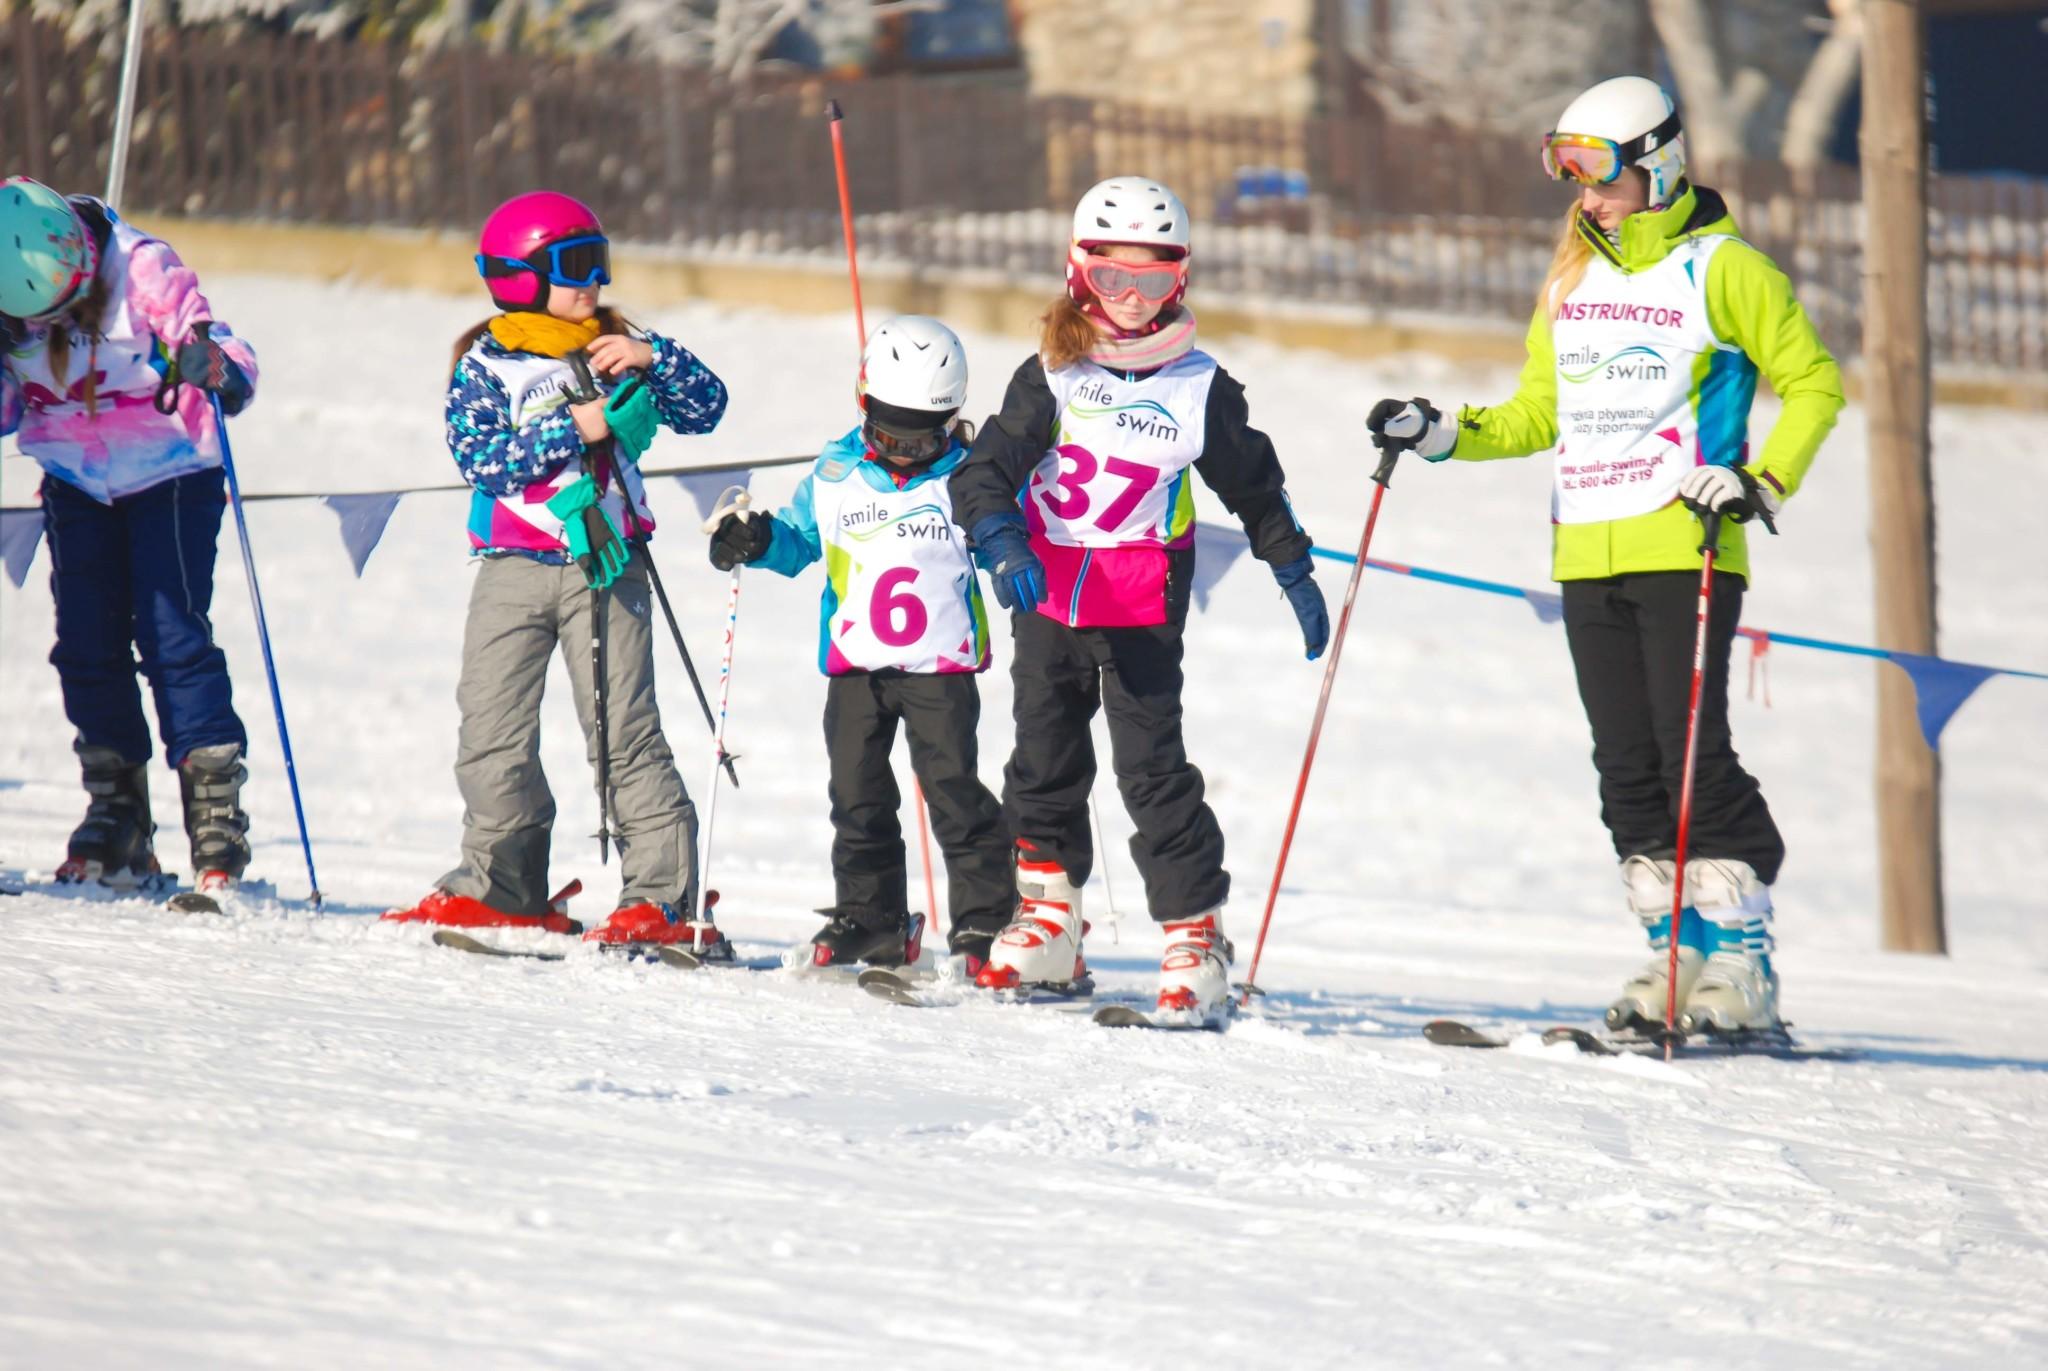 Ferie - grupa narciarska